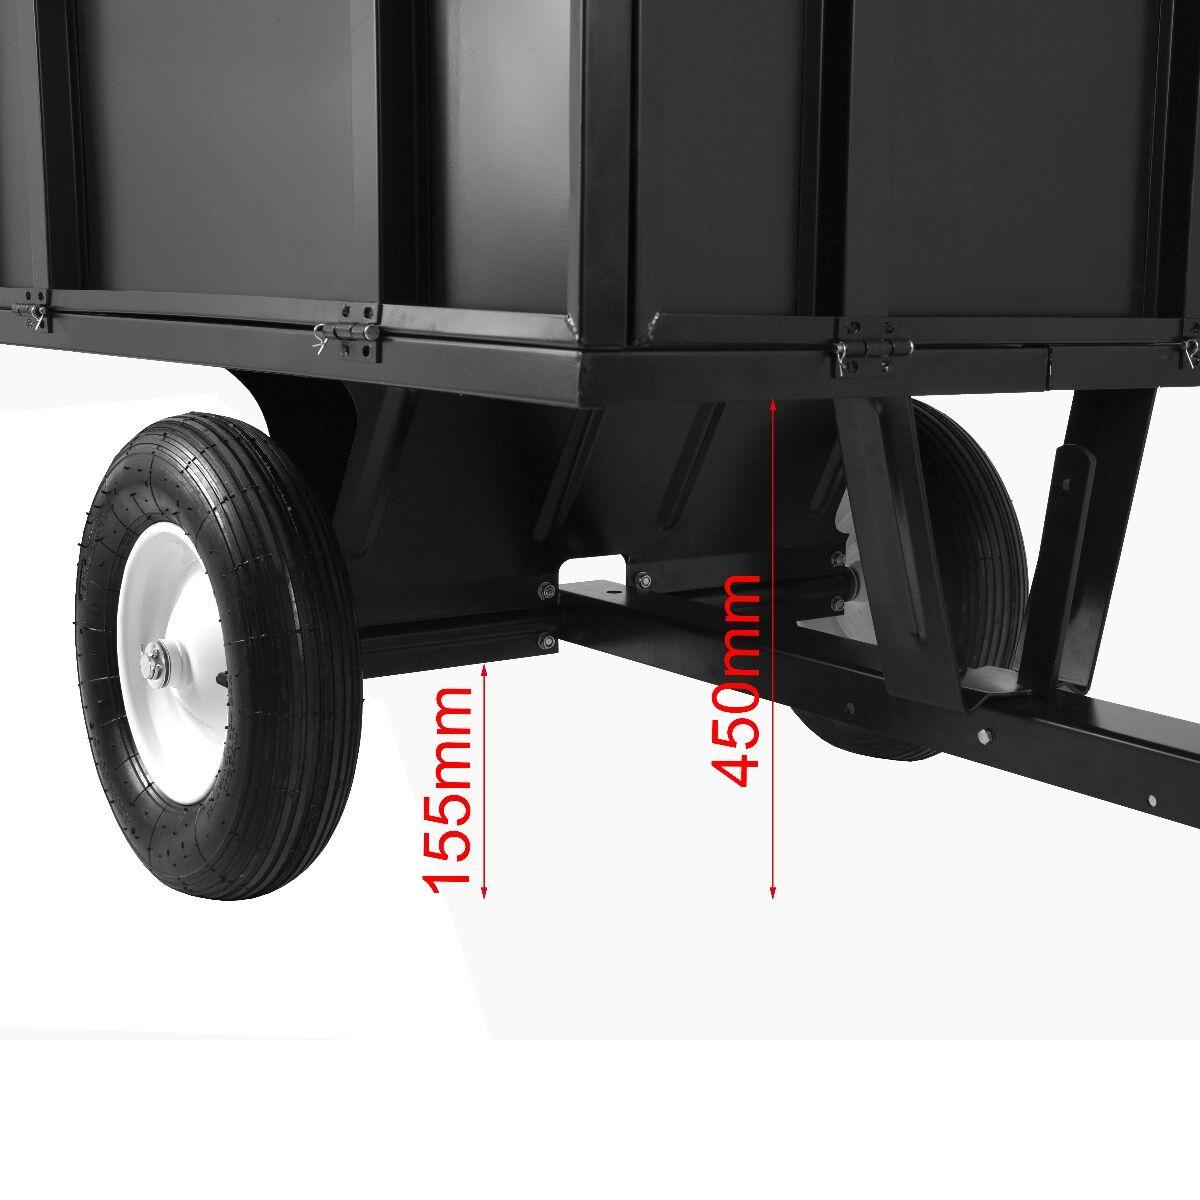 Anhänger kippbar 180KG Kapazität passend für ATV QUAD Rasentraktor